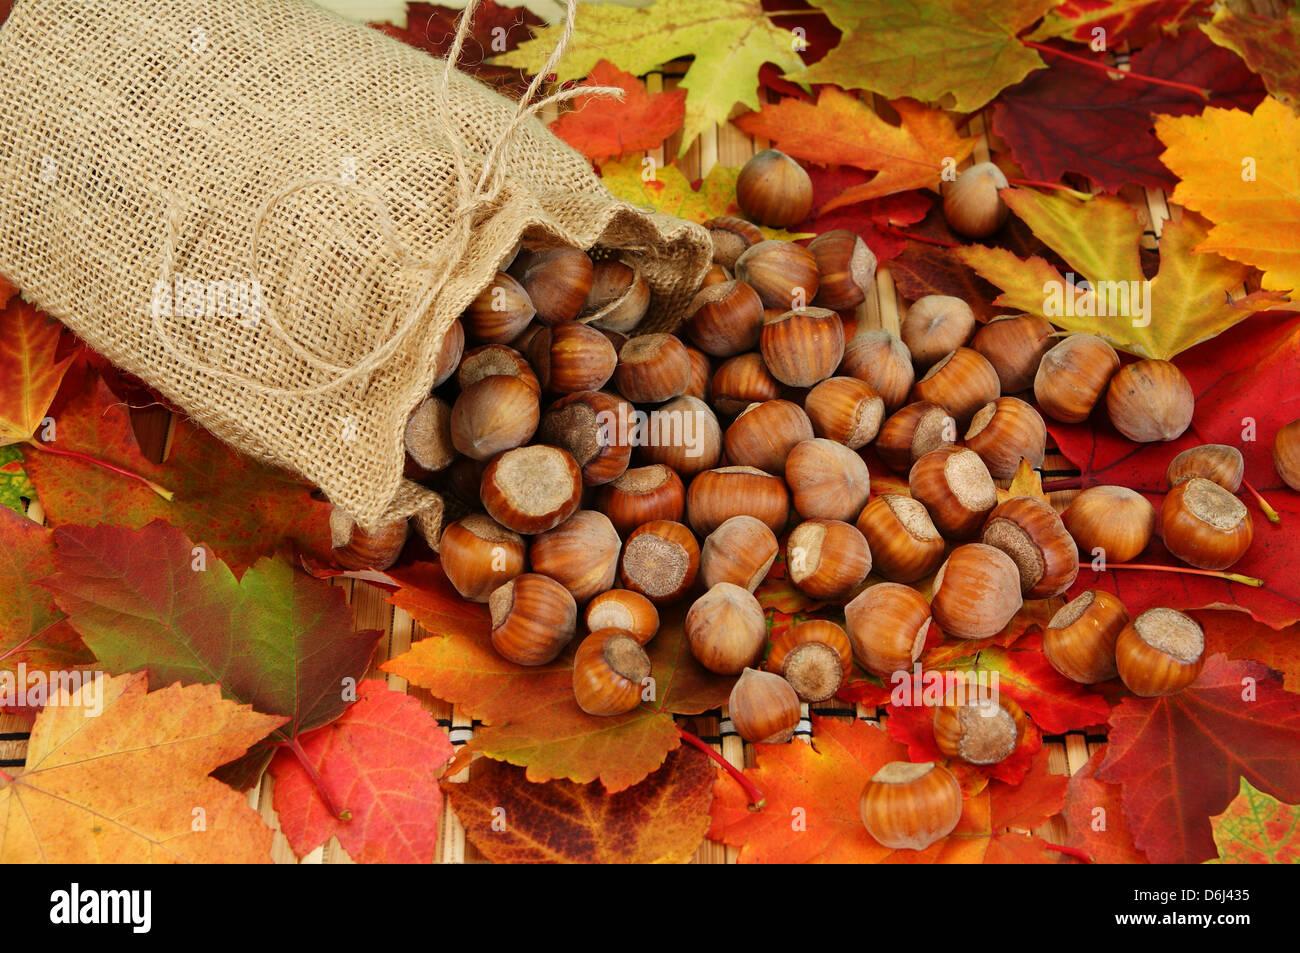 hazelnuts spilled with sack on background leaf - Stock Image